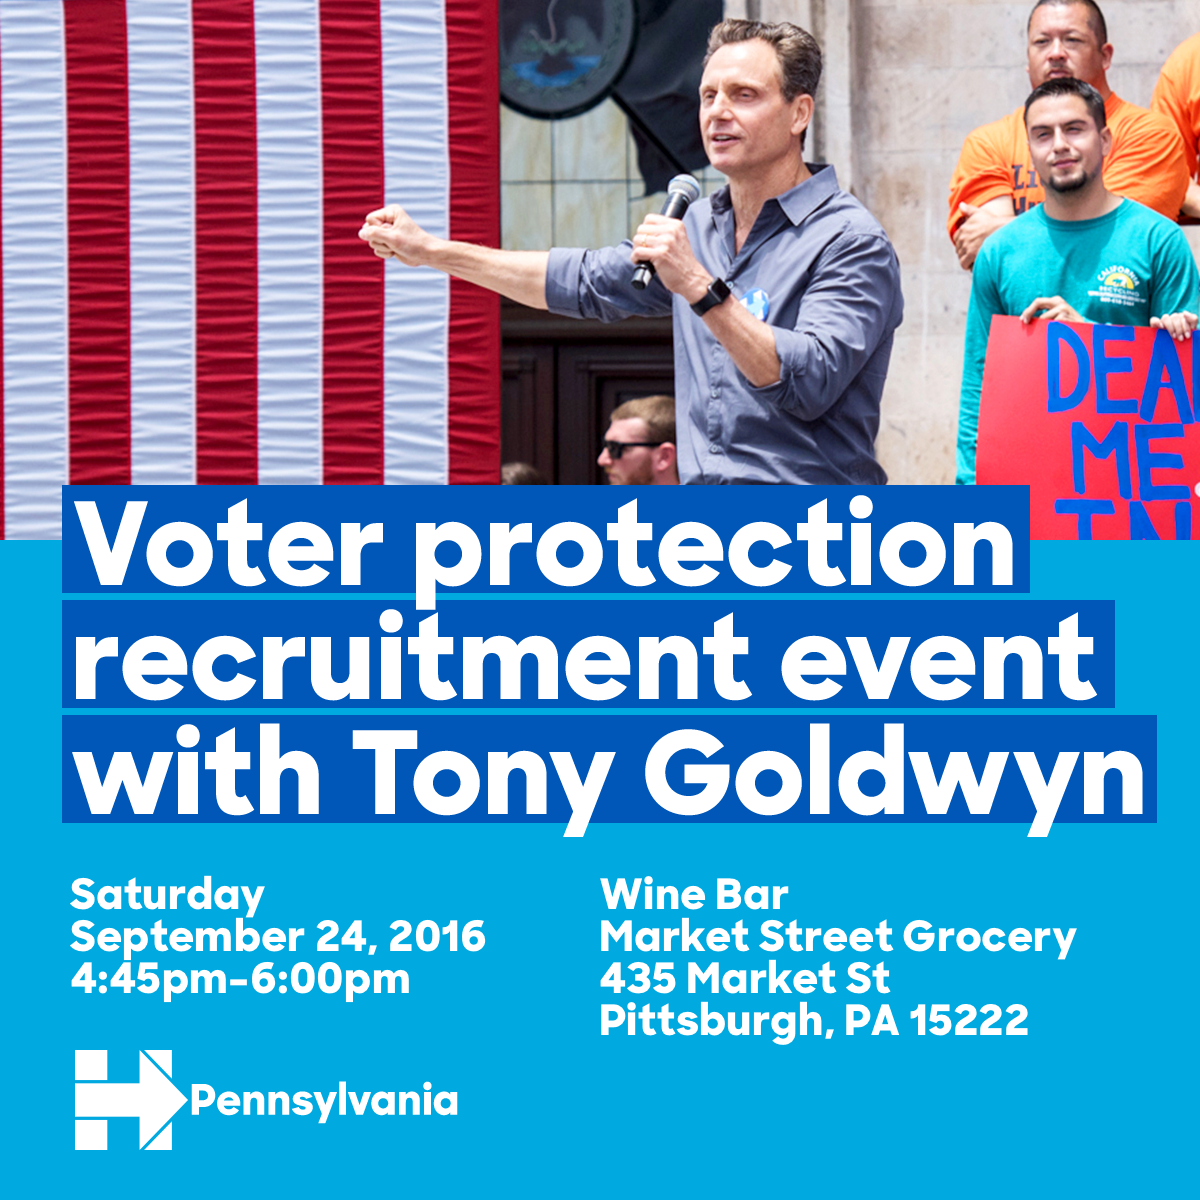 PA-Tony-Goldwyn-Event-092016 (1).png